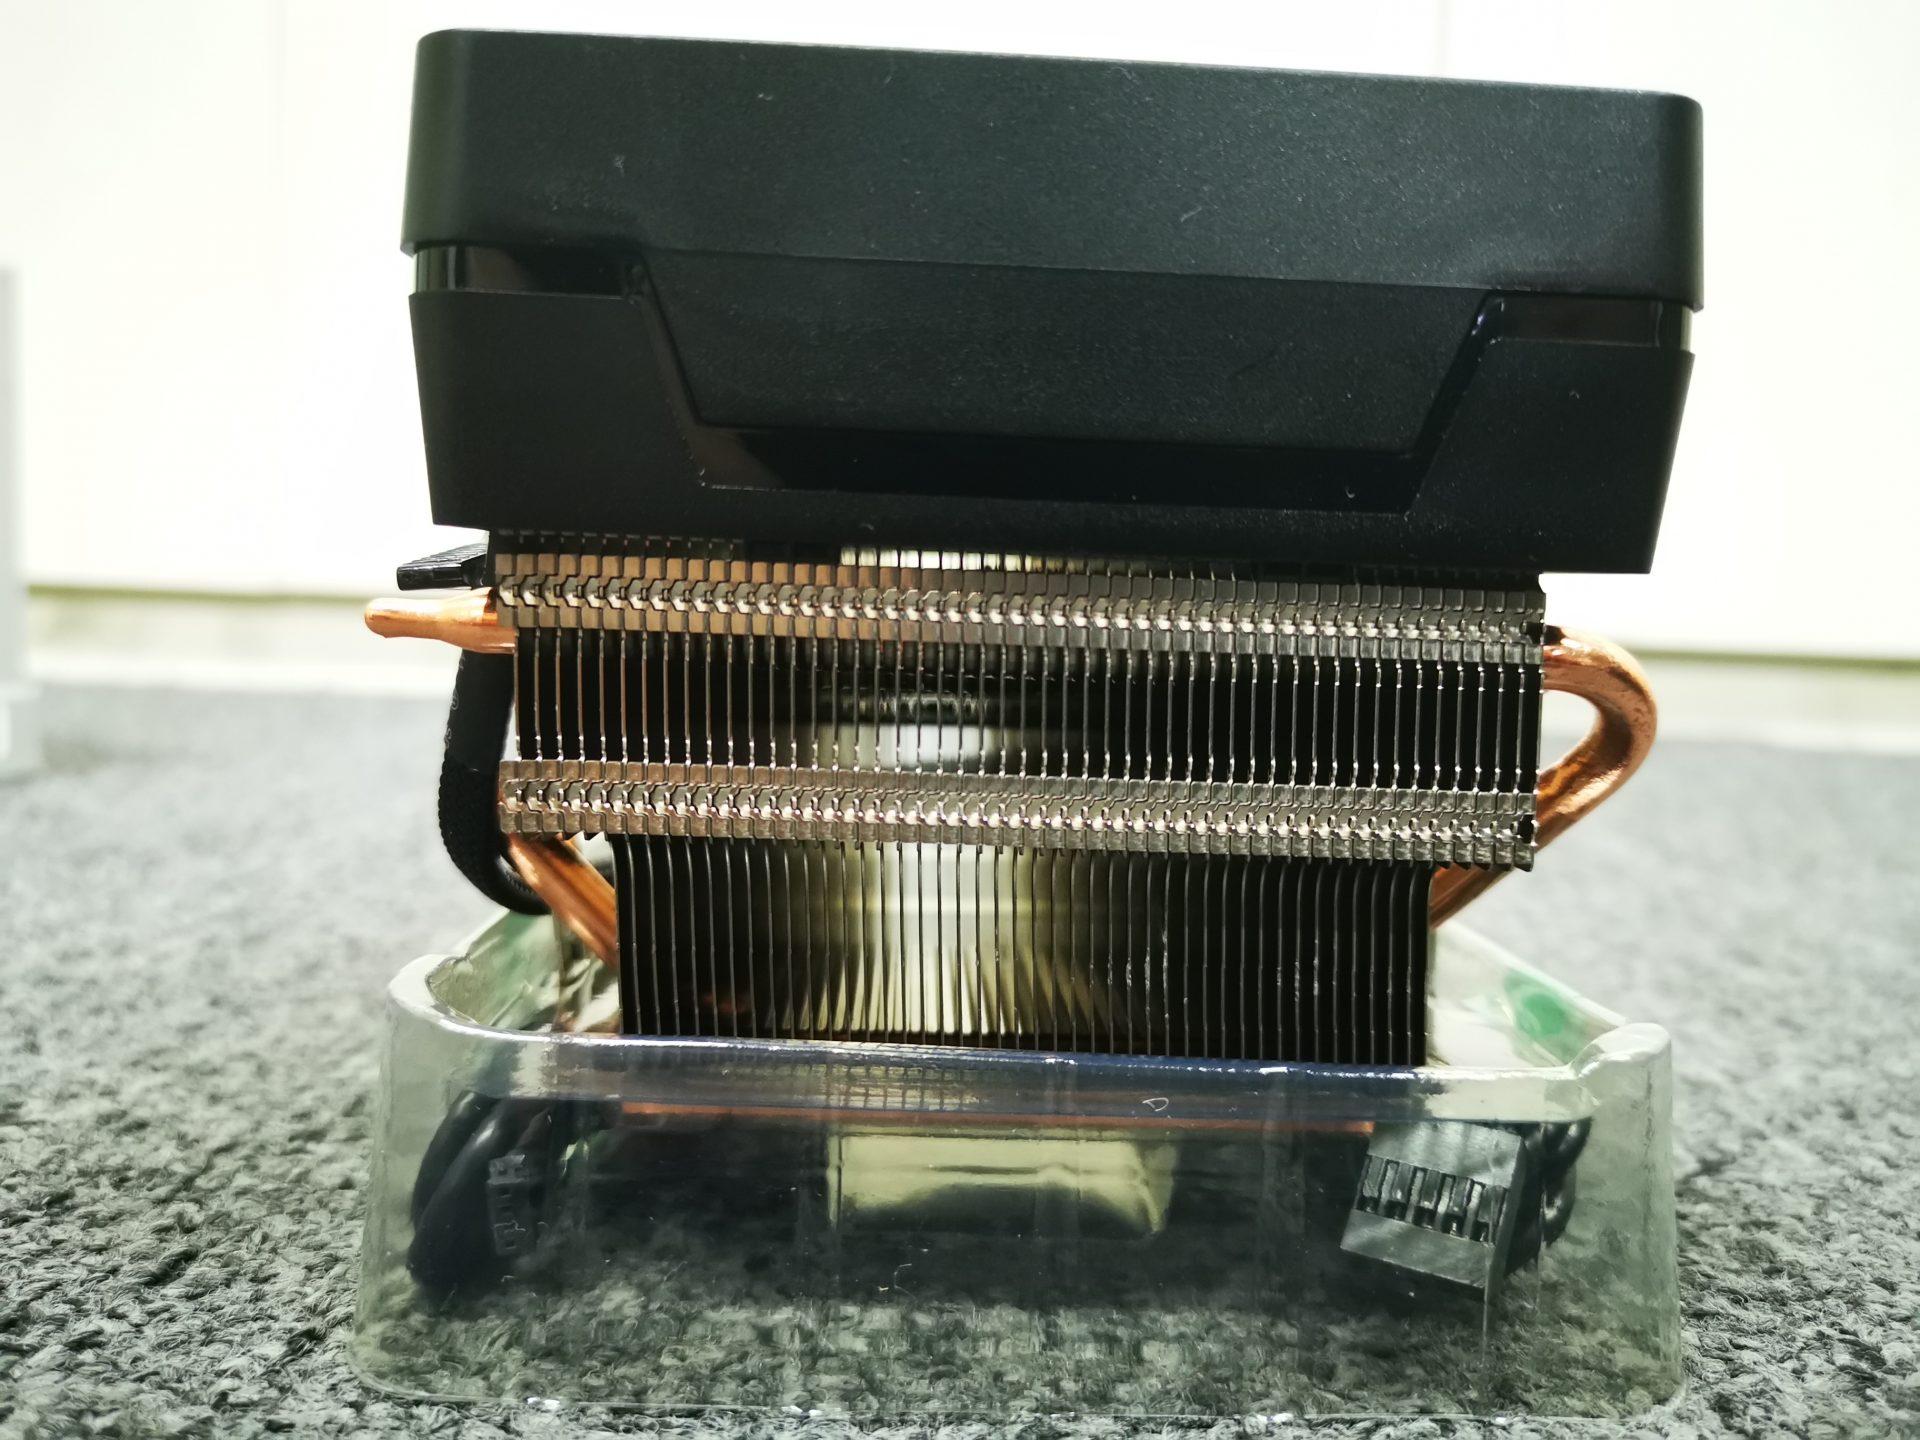 Review of AMD Ryzen 7 3700X and Ryzen 9 3900X - Best Consumer CPUs